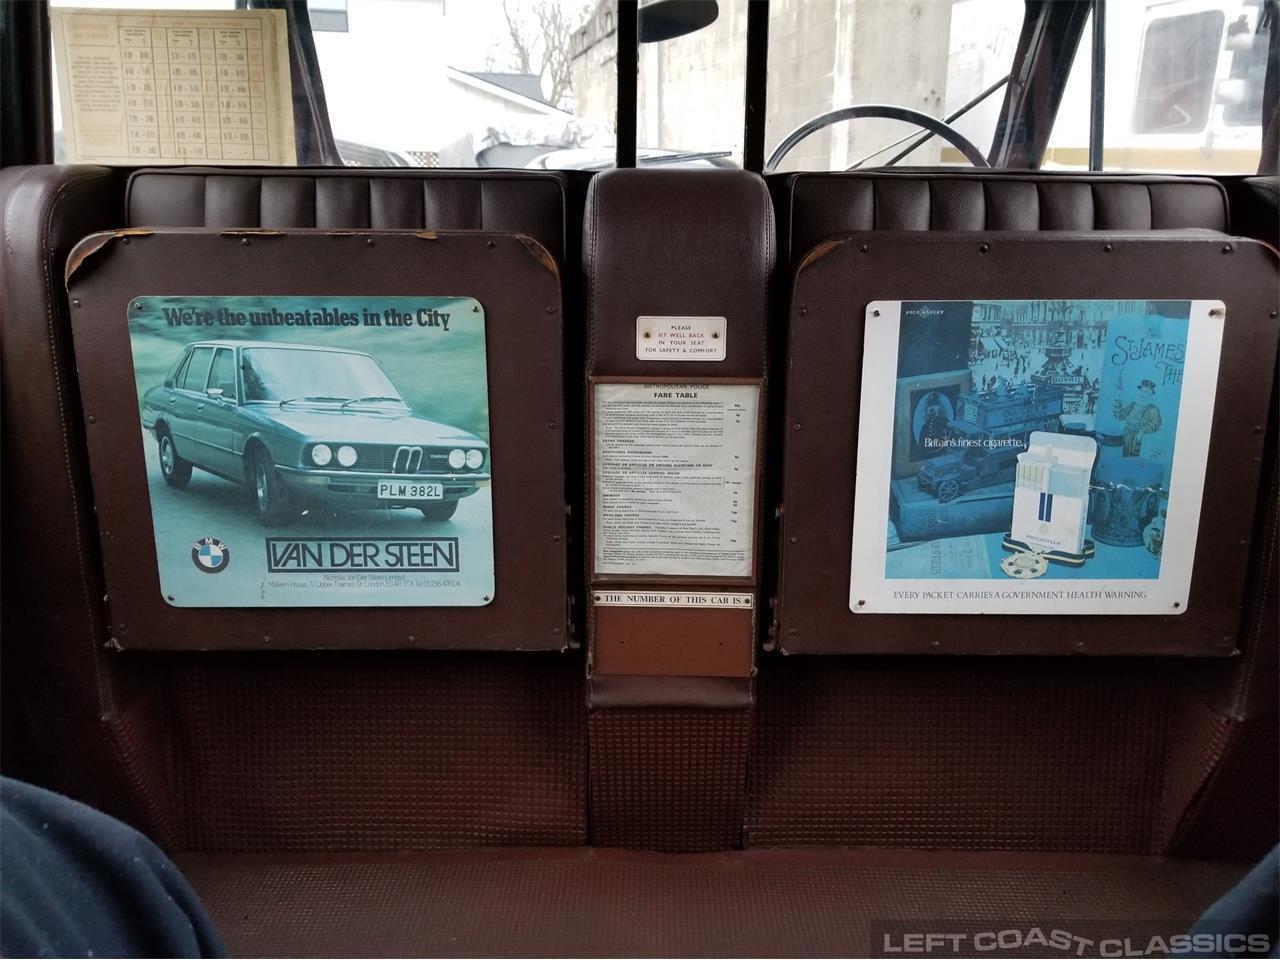 Large Picture of Classic 1967 Austin FX4 Taxi Cab - PKBX